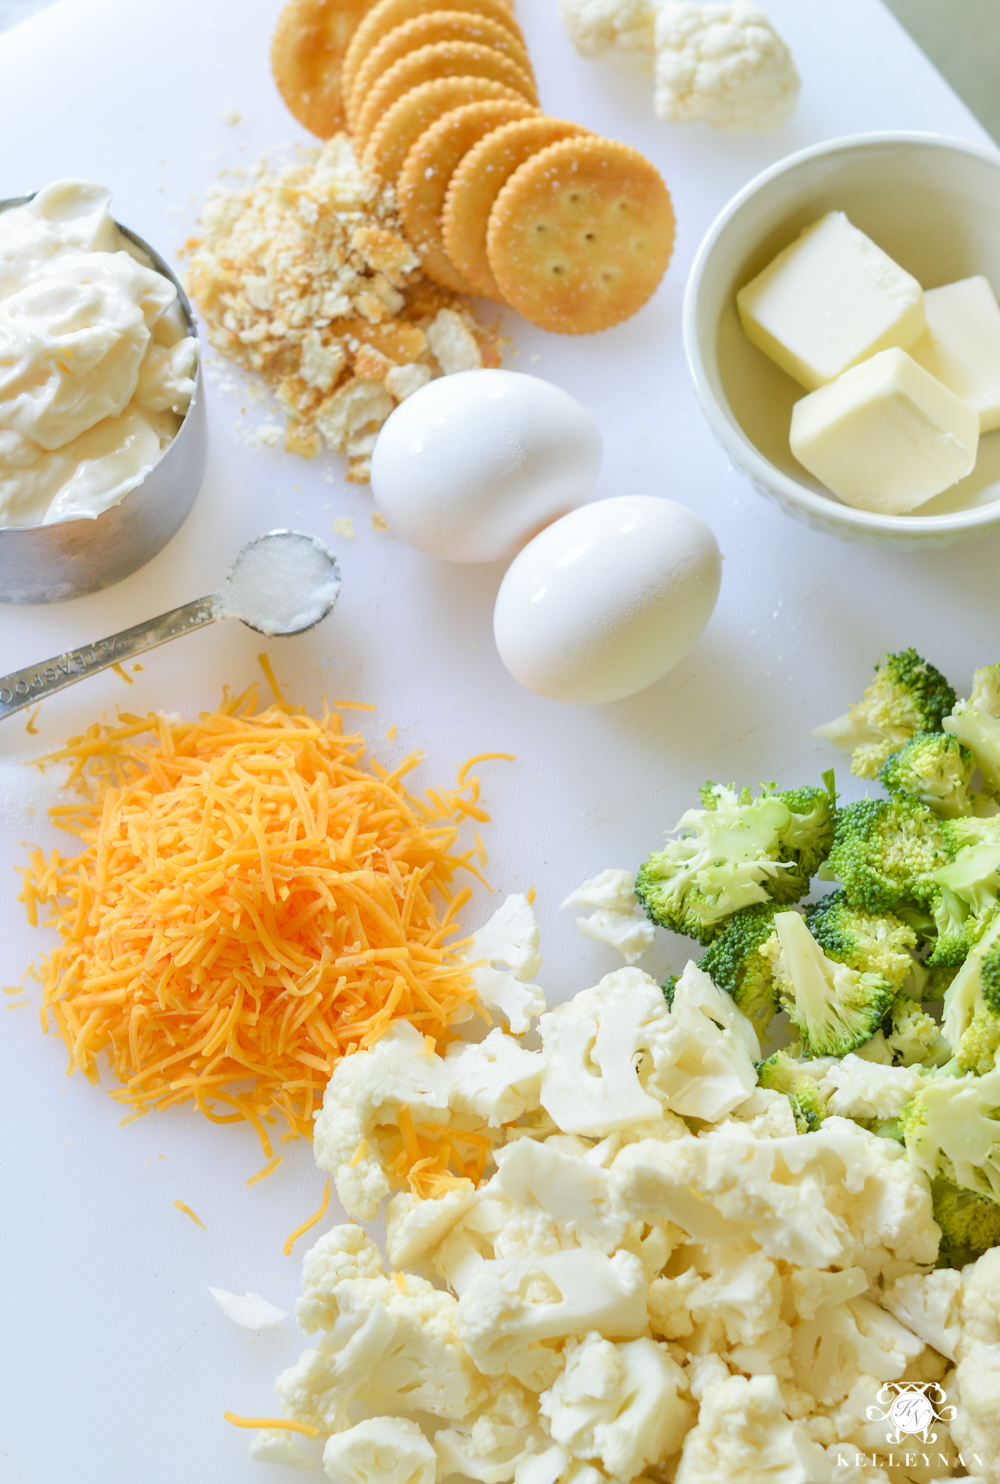 Easy Favorite Broccoli Cauliflower Casserole Recipe with Ritz Crackers